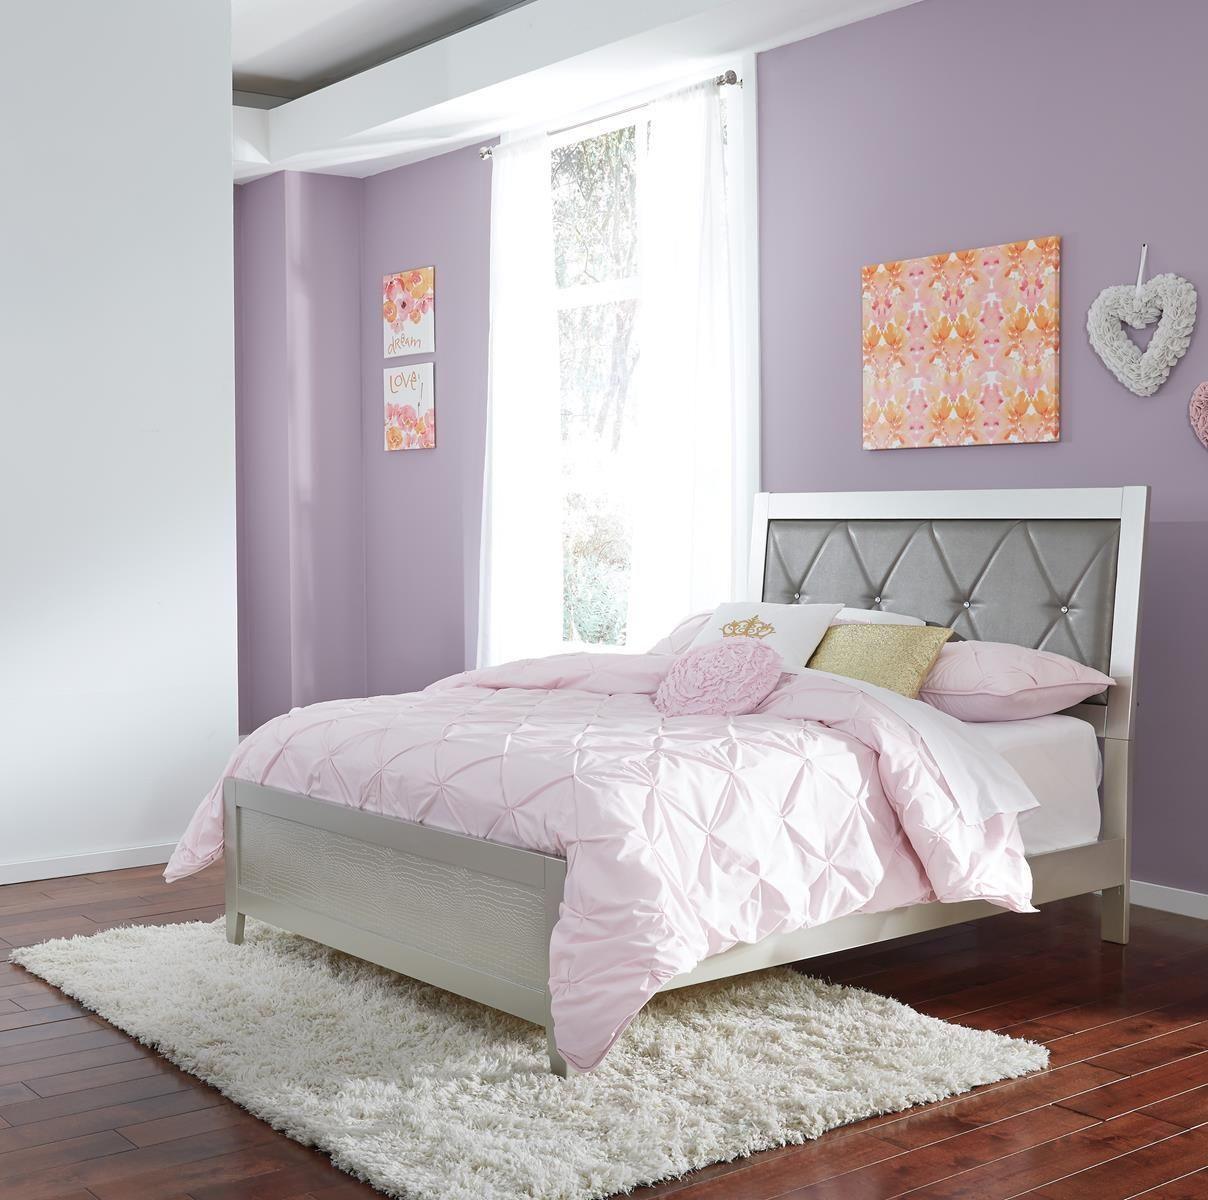 Olivet Full Upholstered Panel Bed in Silver B560F Ashley